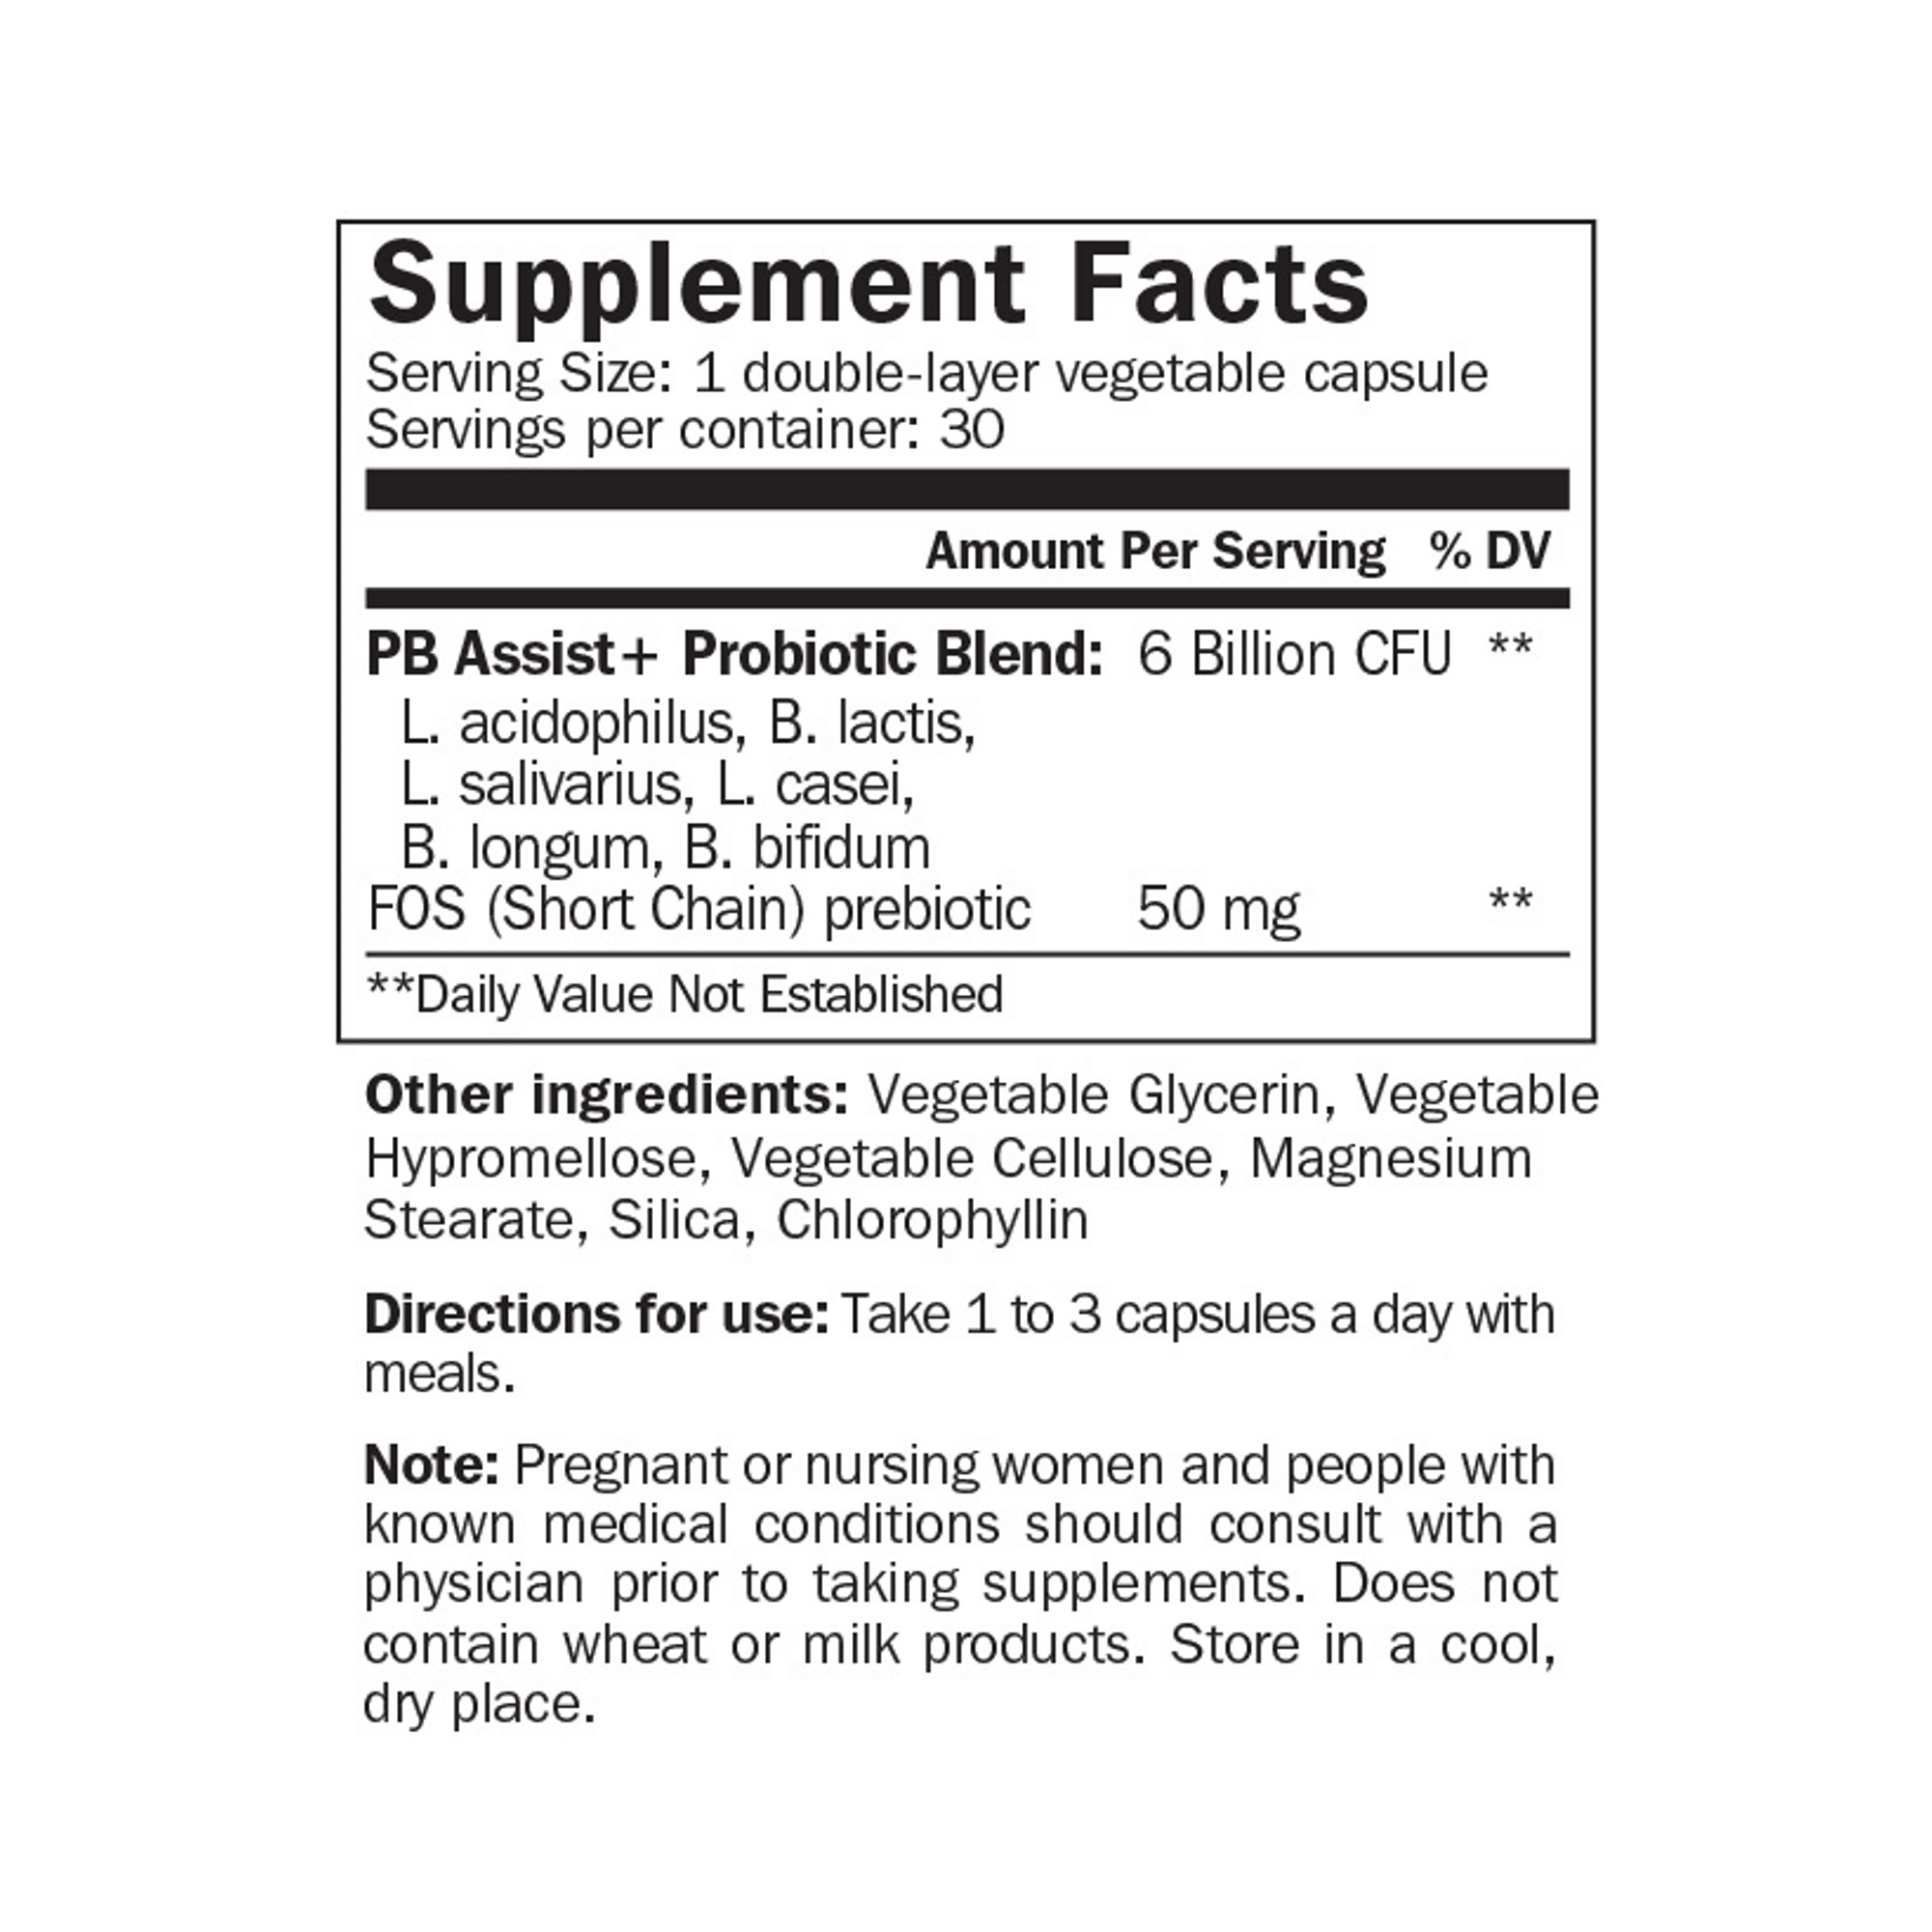 Lợi Khuẩn Cho Đường Ruột - PB Assist ®+ Probiotic Defense Formula